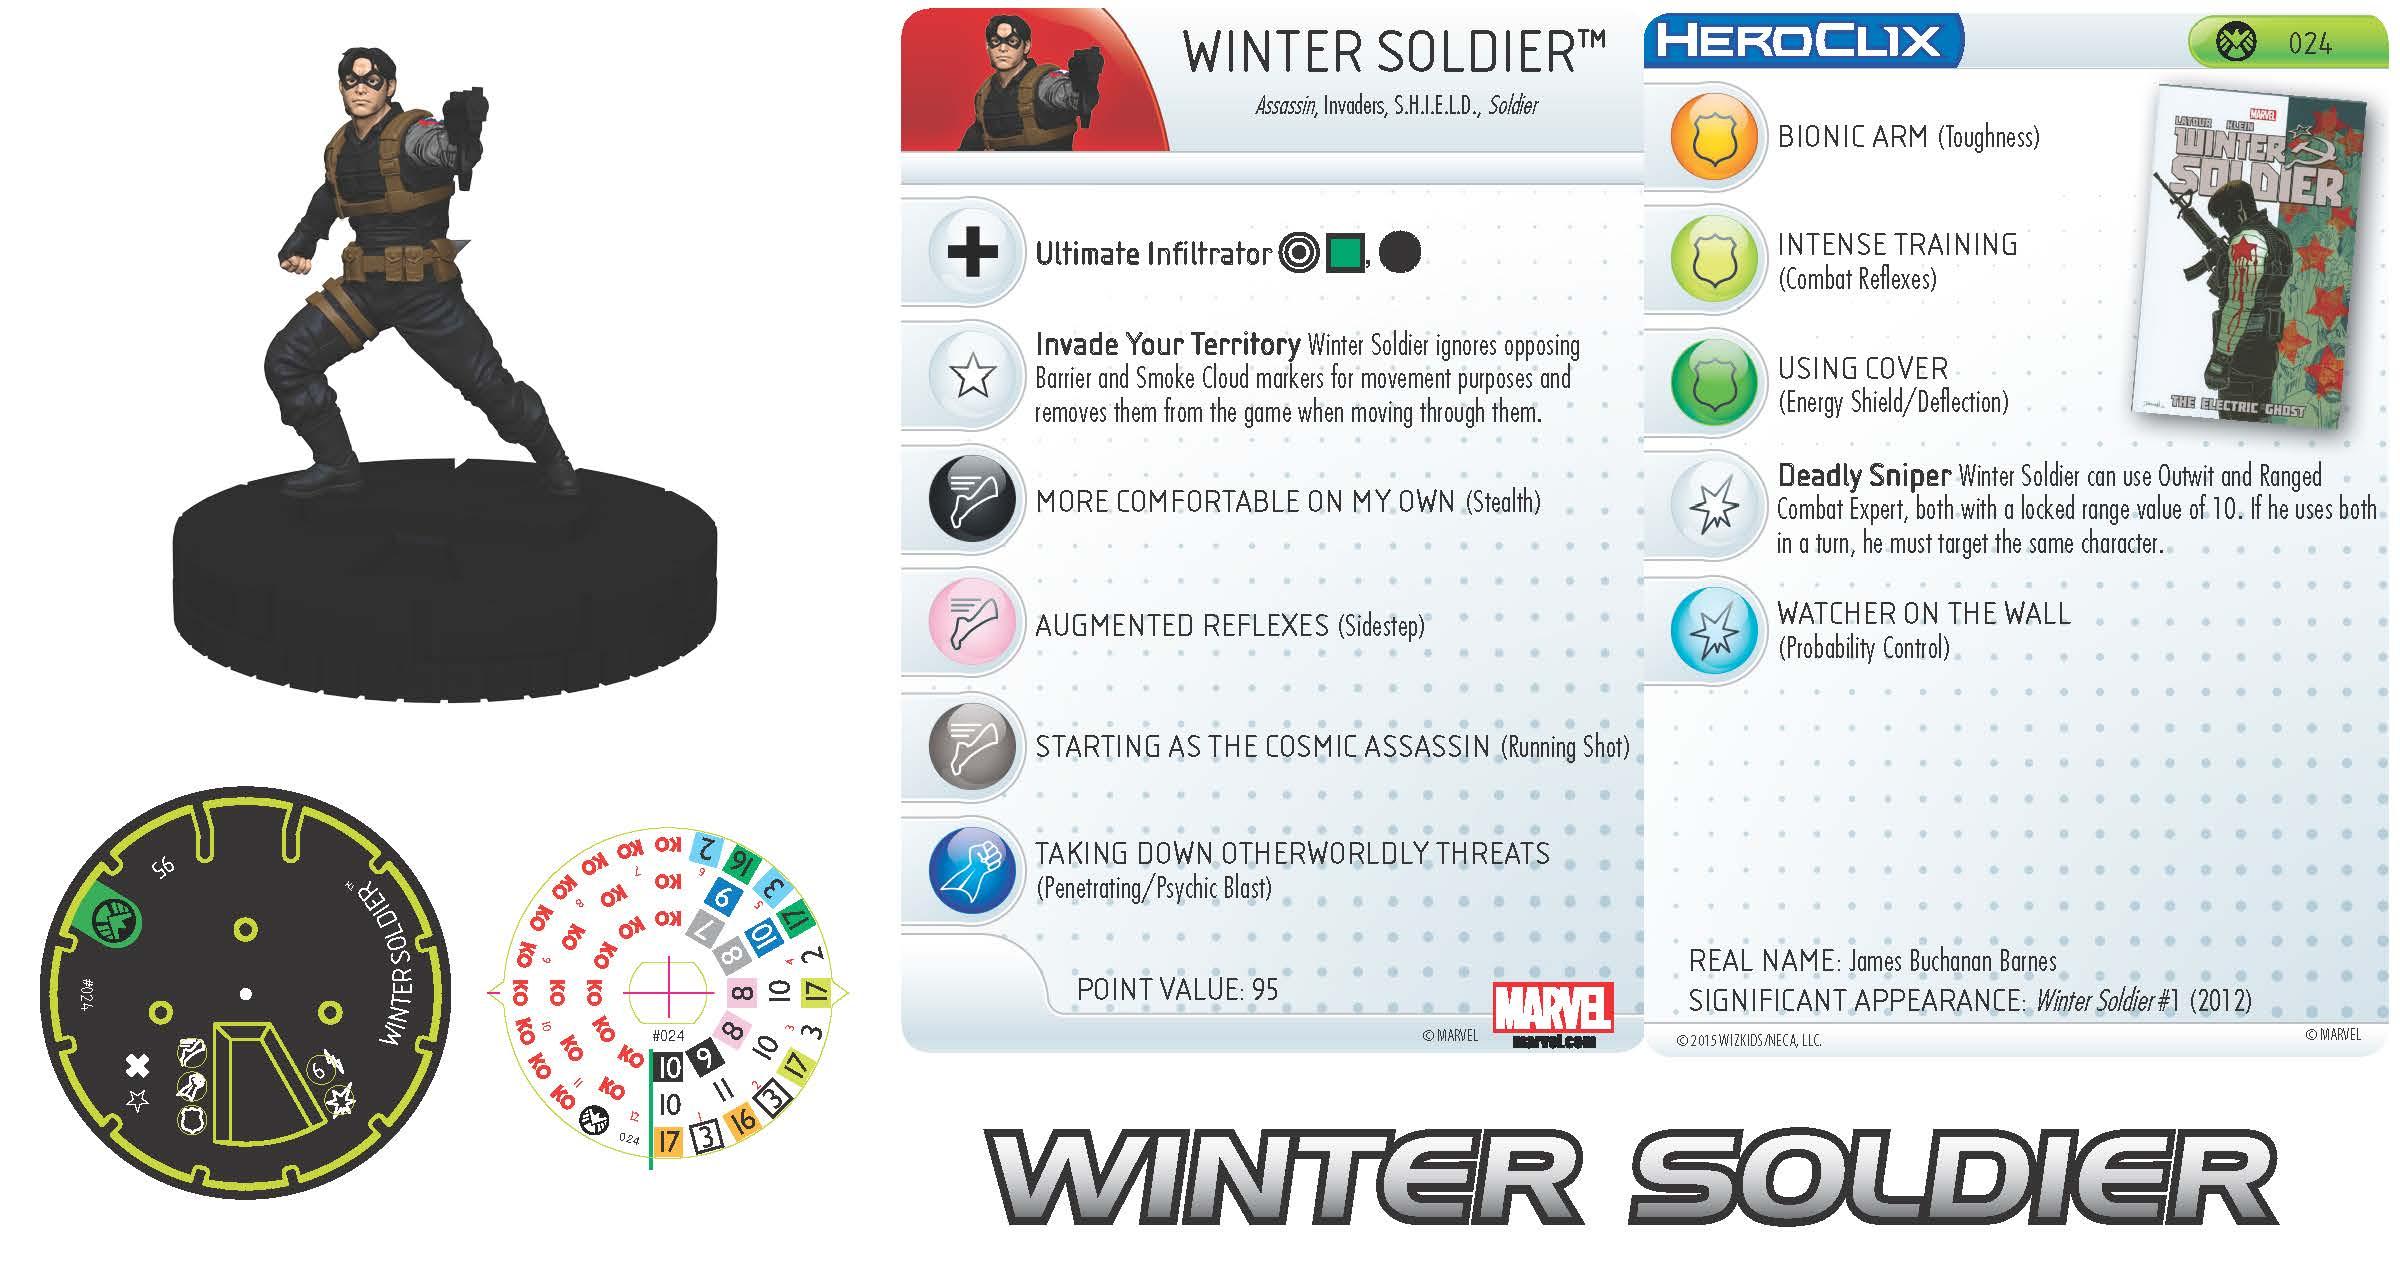 MV26 Winter Soldier 024